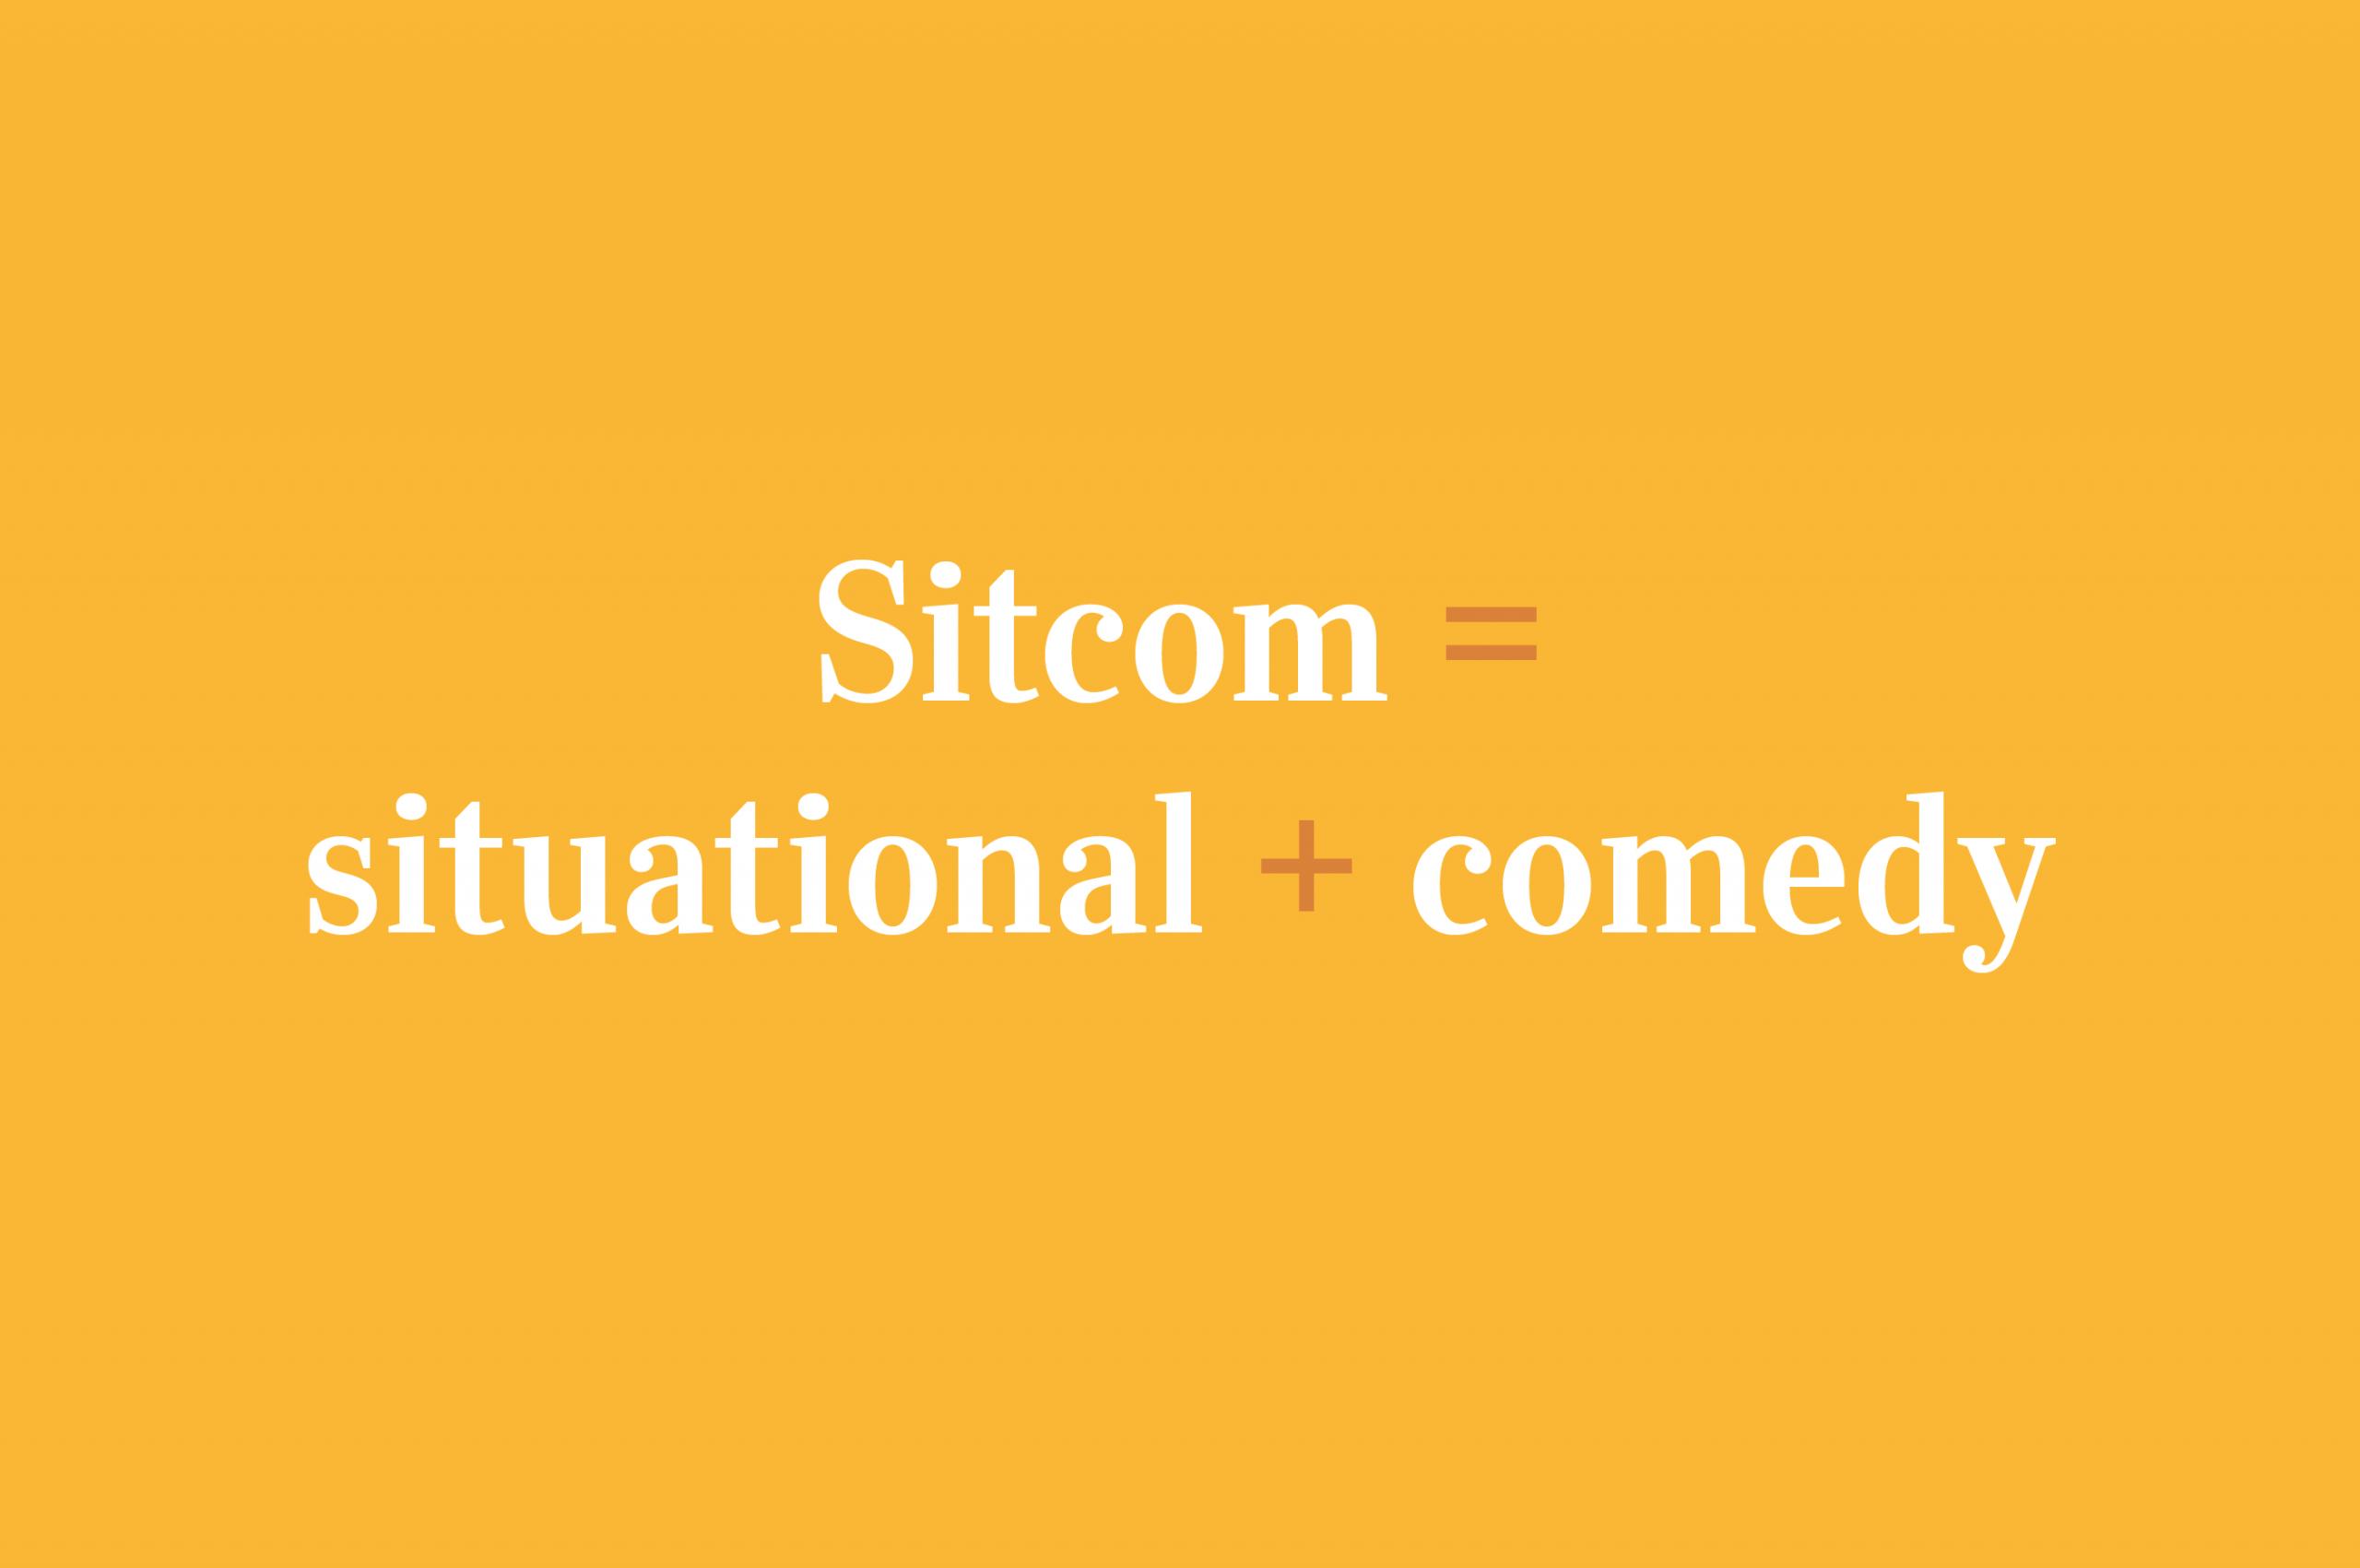 Sitcom = Situational + Comedy